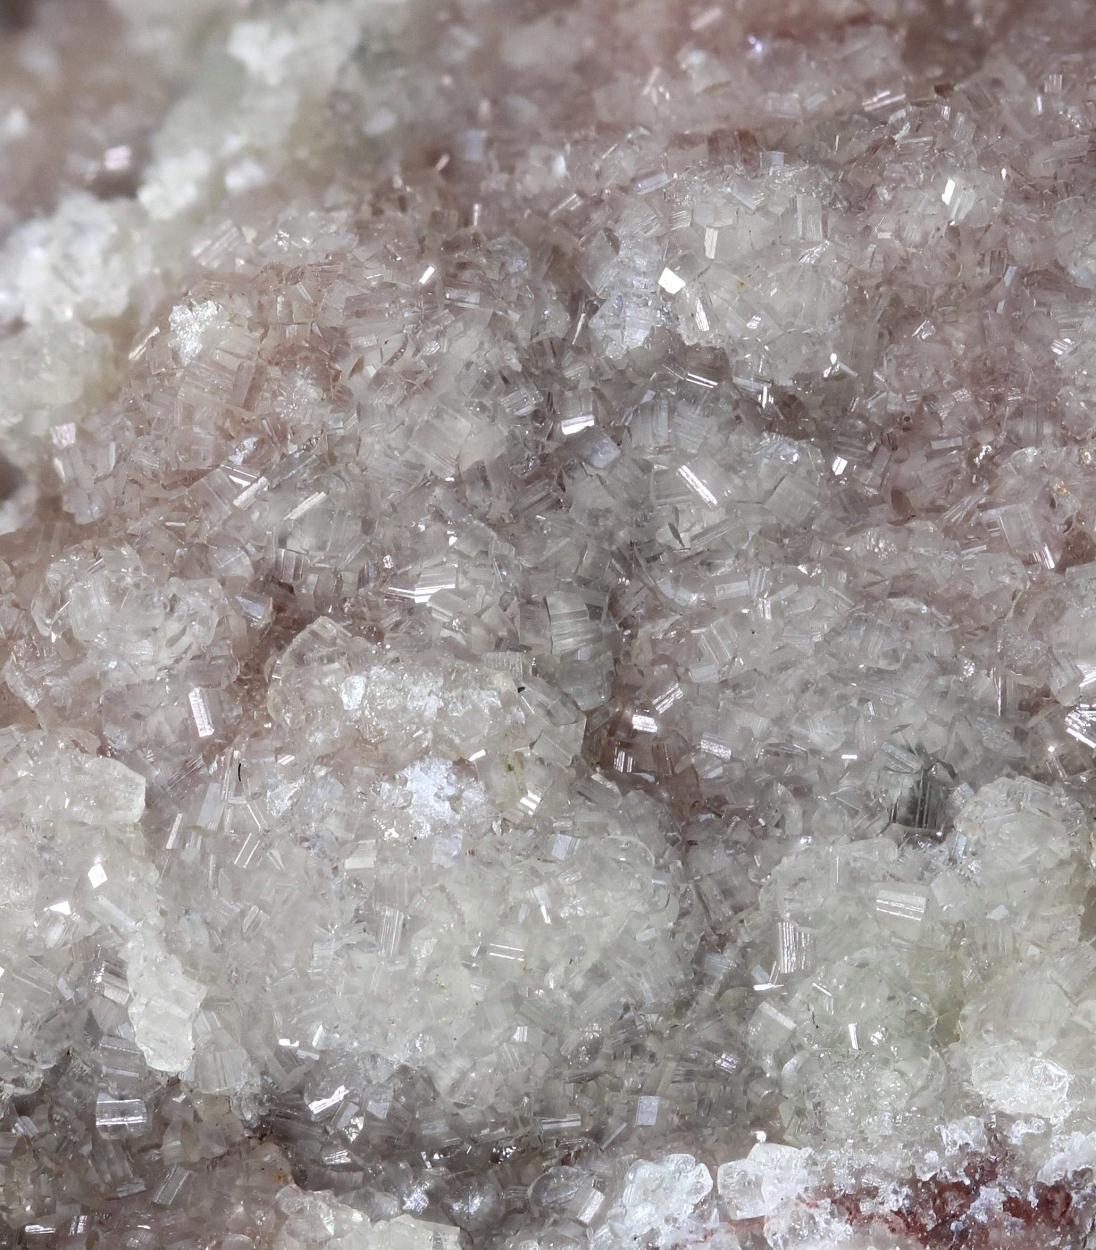 Carbonate-rich Fluorapatite